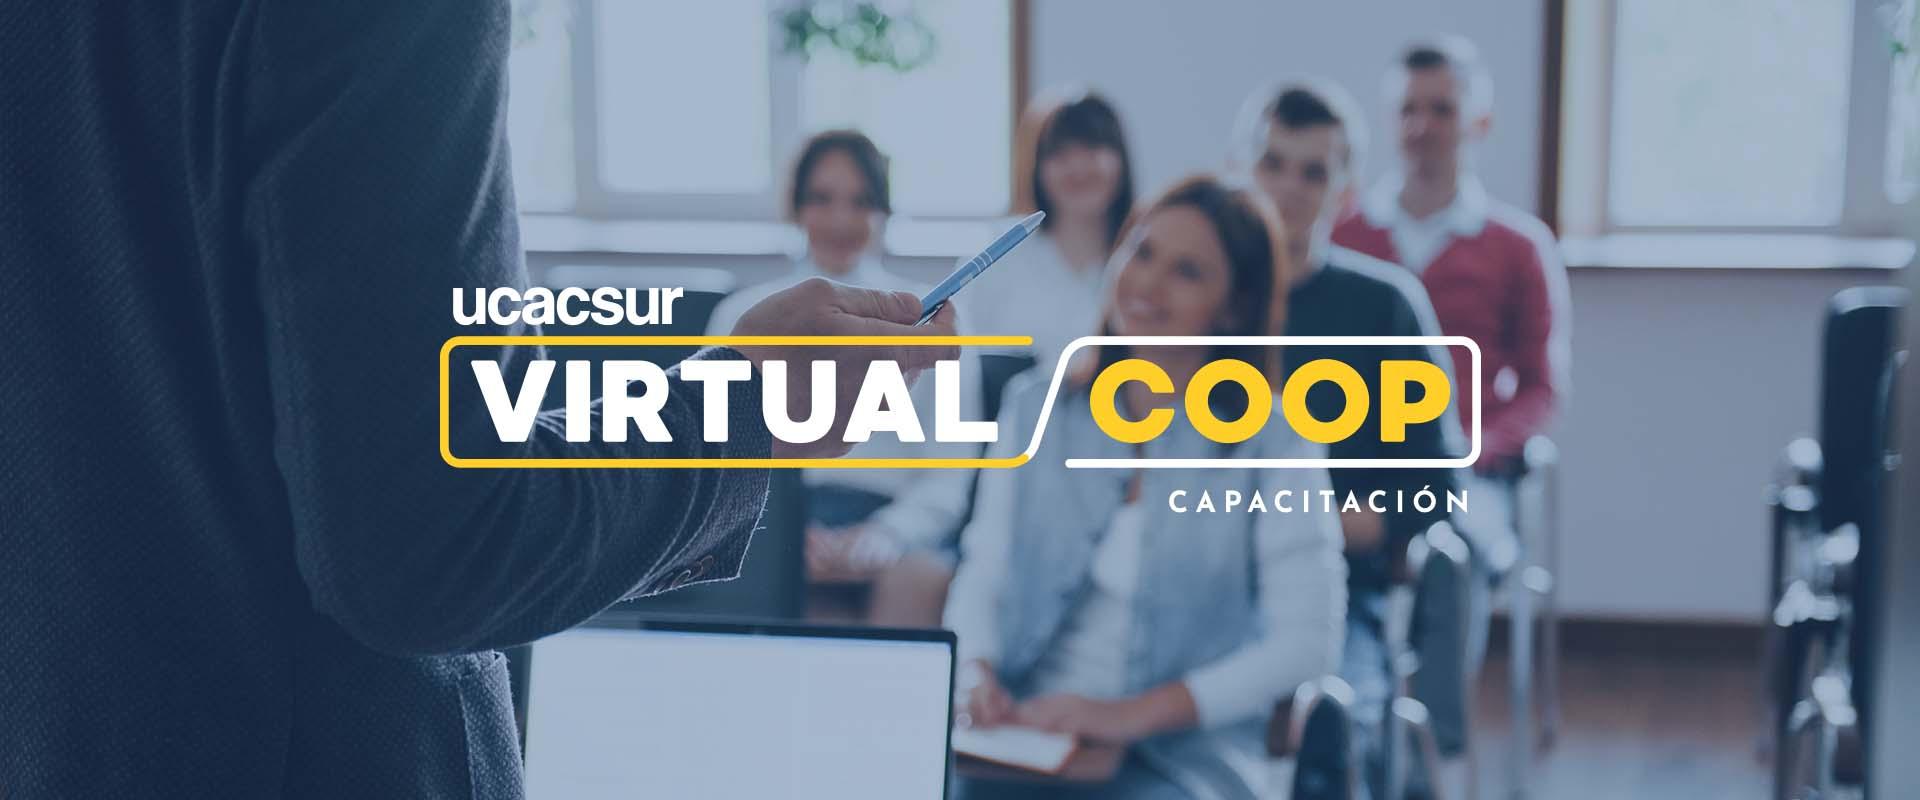 virtualcoop